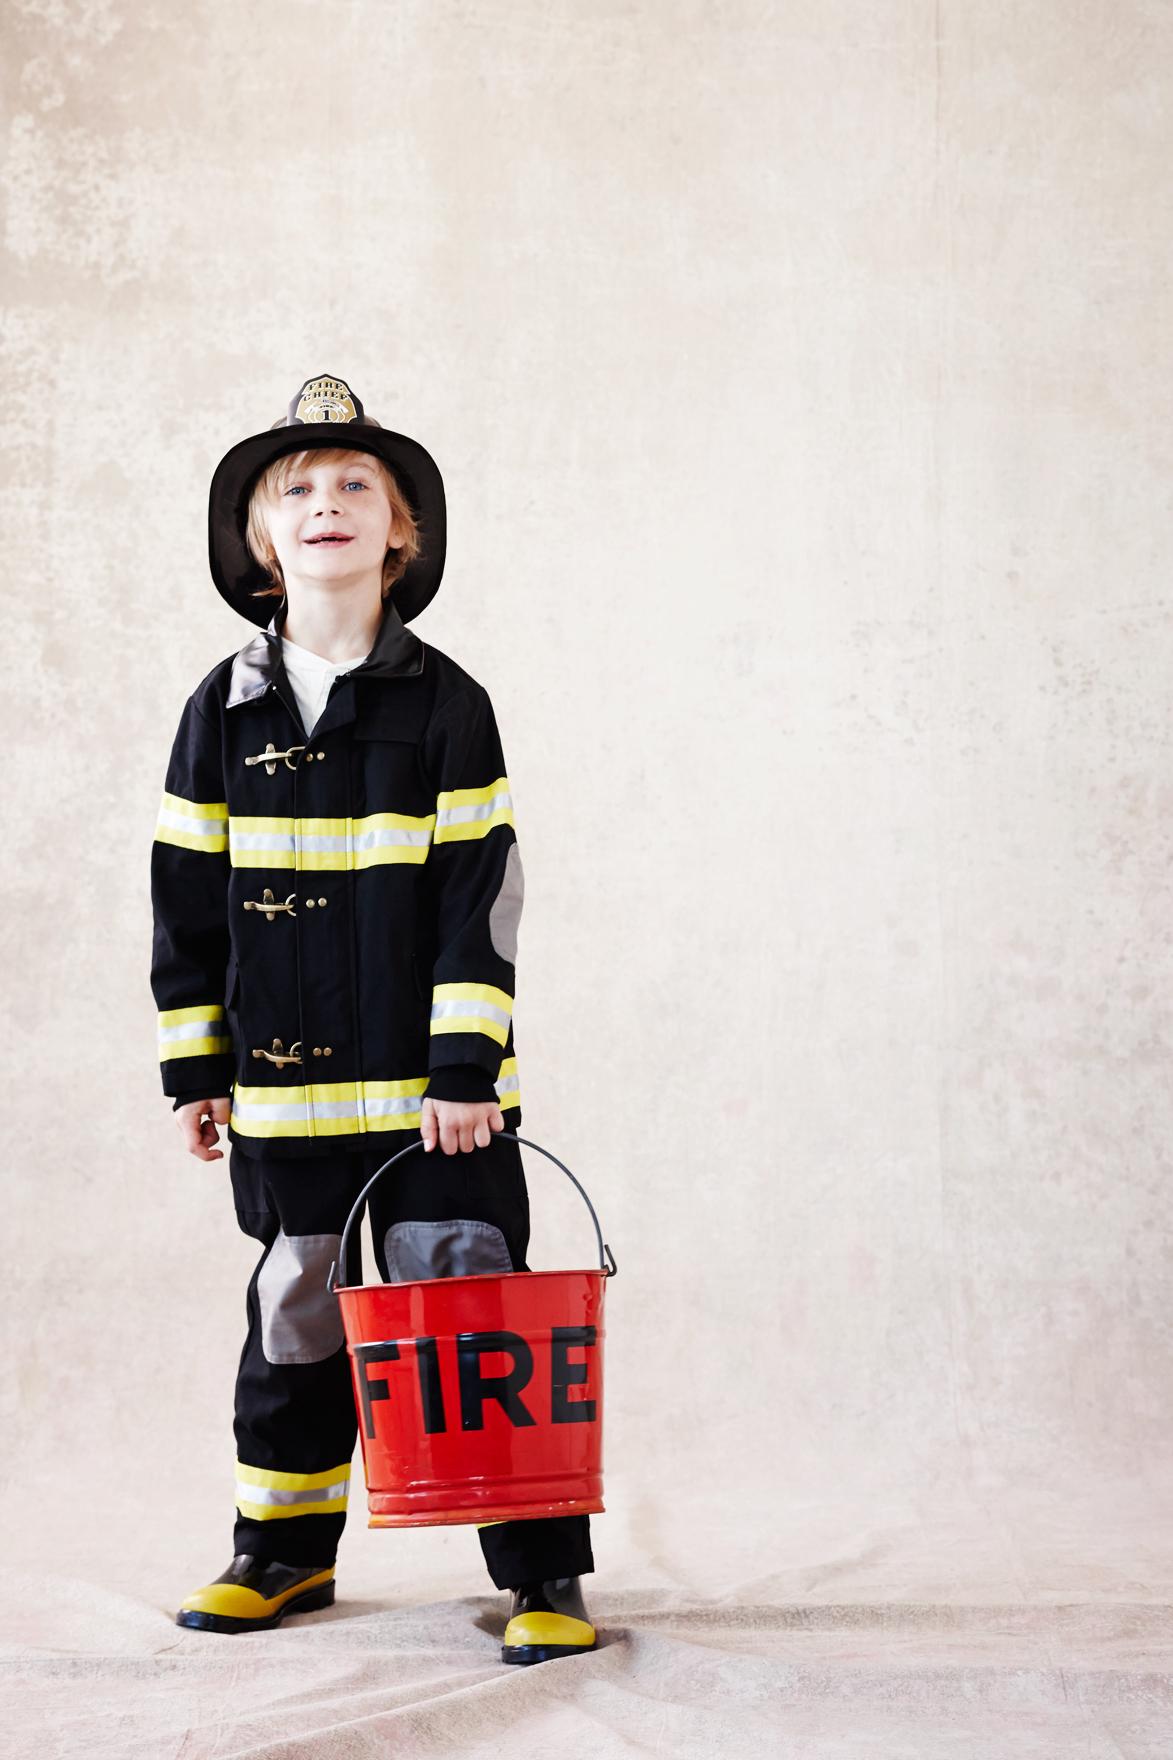 NoahI_Fireman_dana_gallagher0038.jpg